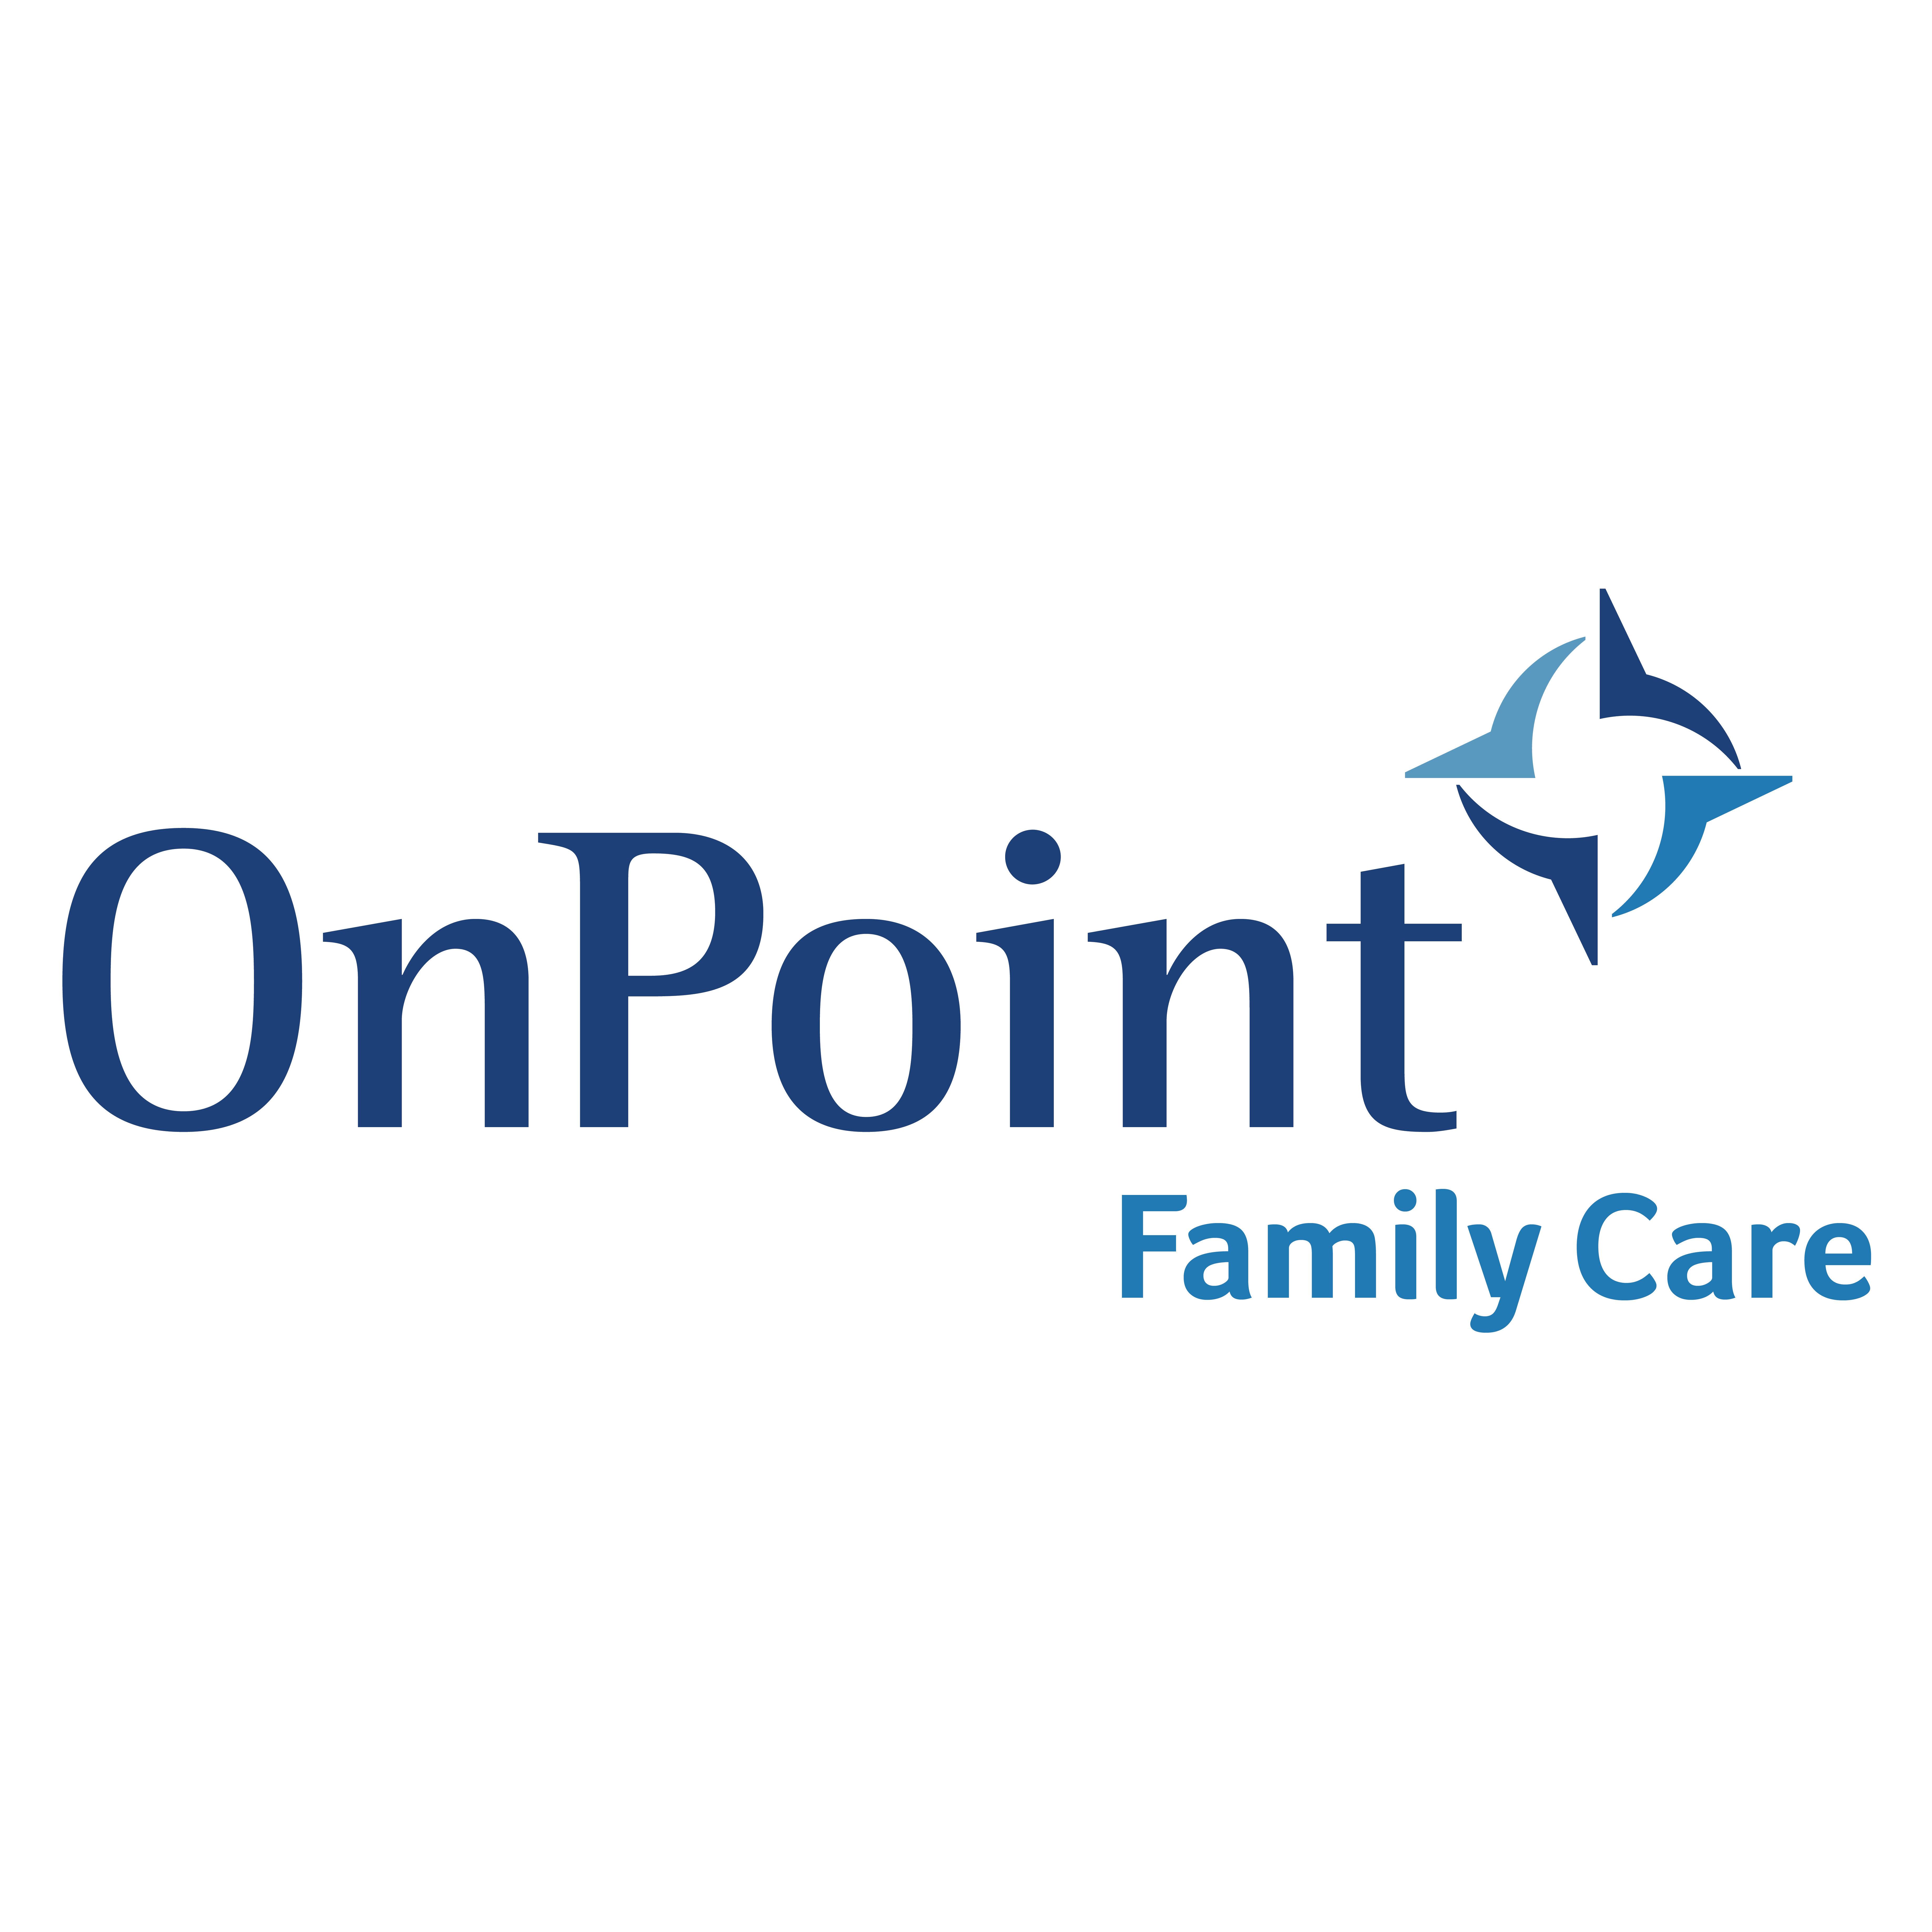 OnPoint Family Care: Denver Tech Center, Greenwood Village